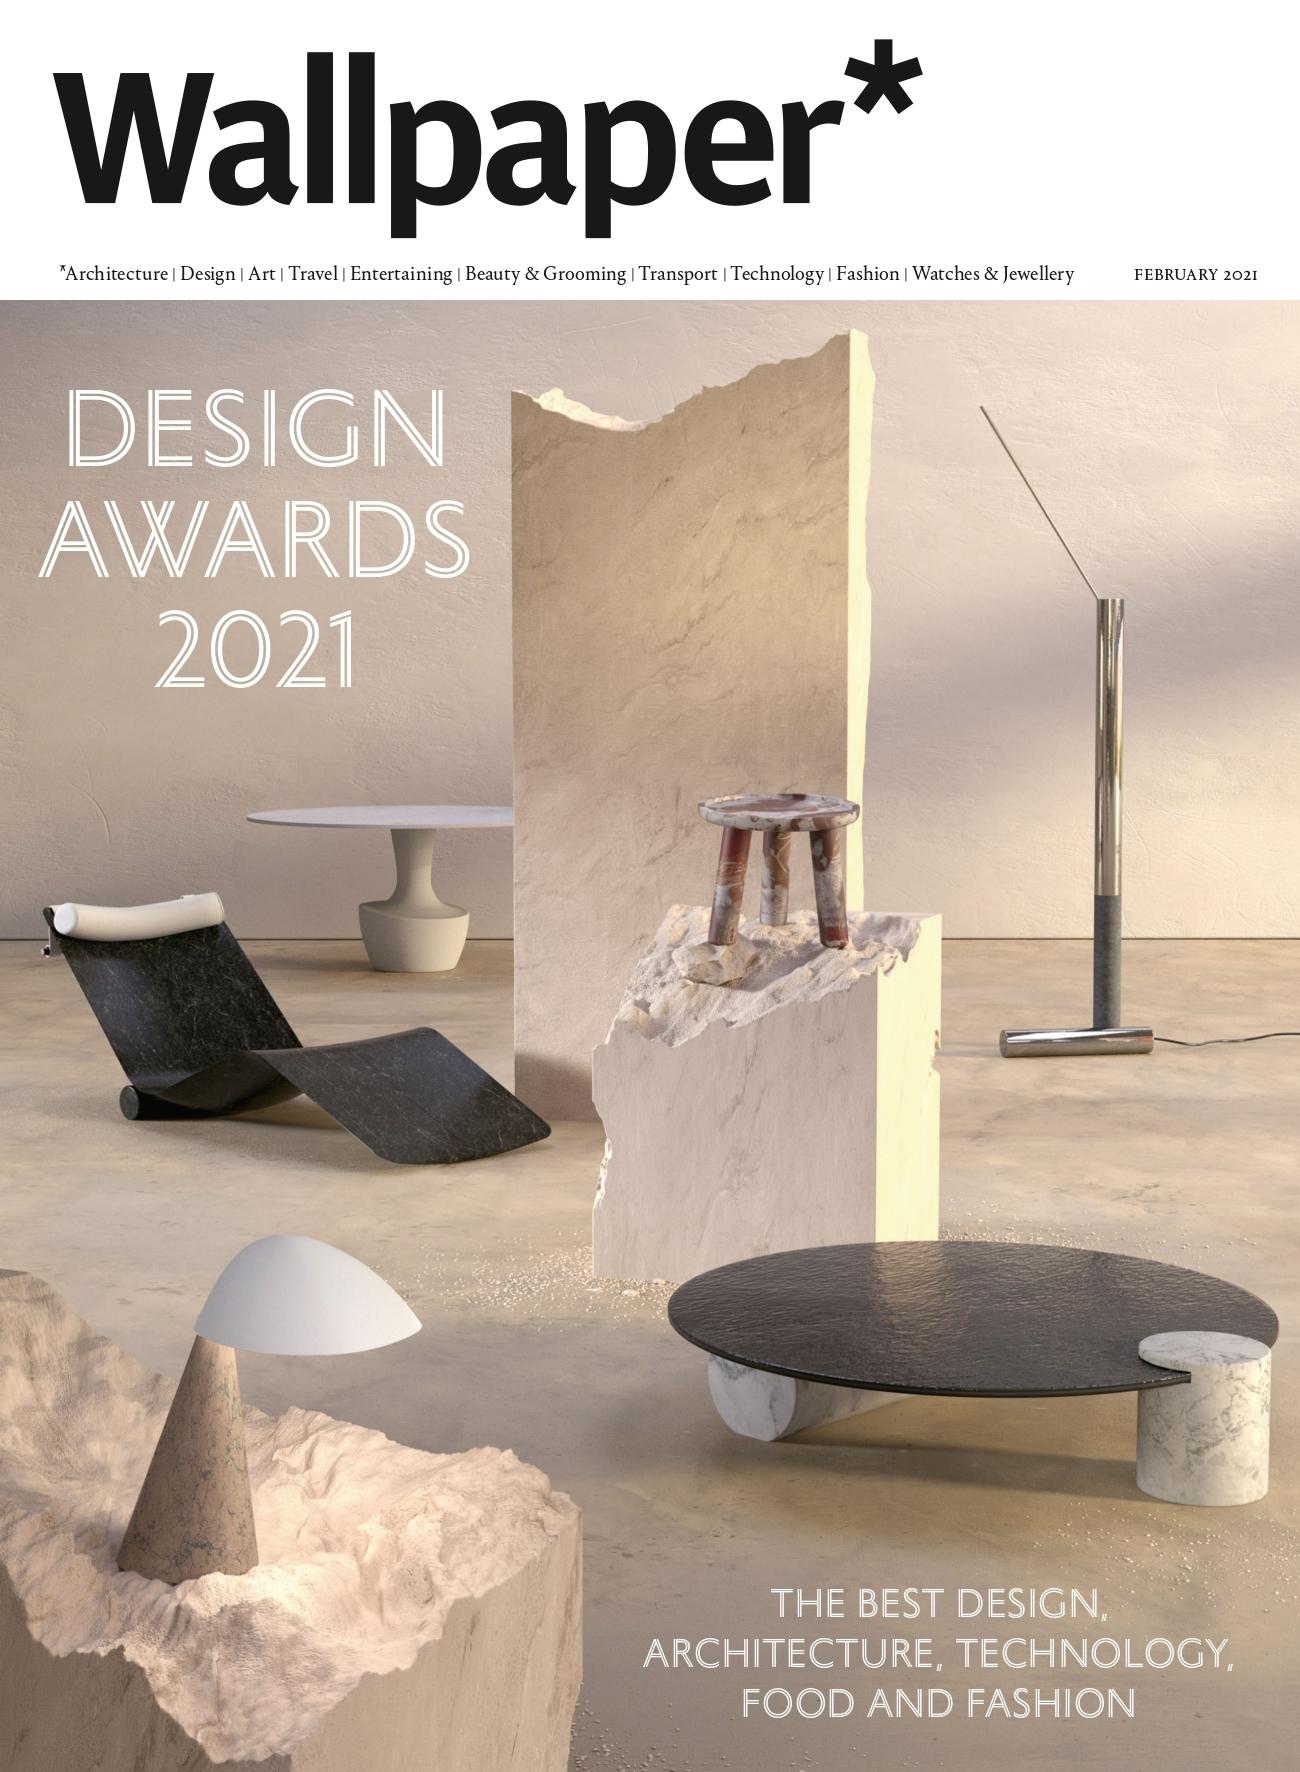 Vvda 2020 Wallpaper Design Awards 2021 Cover